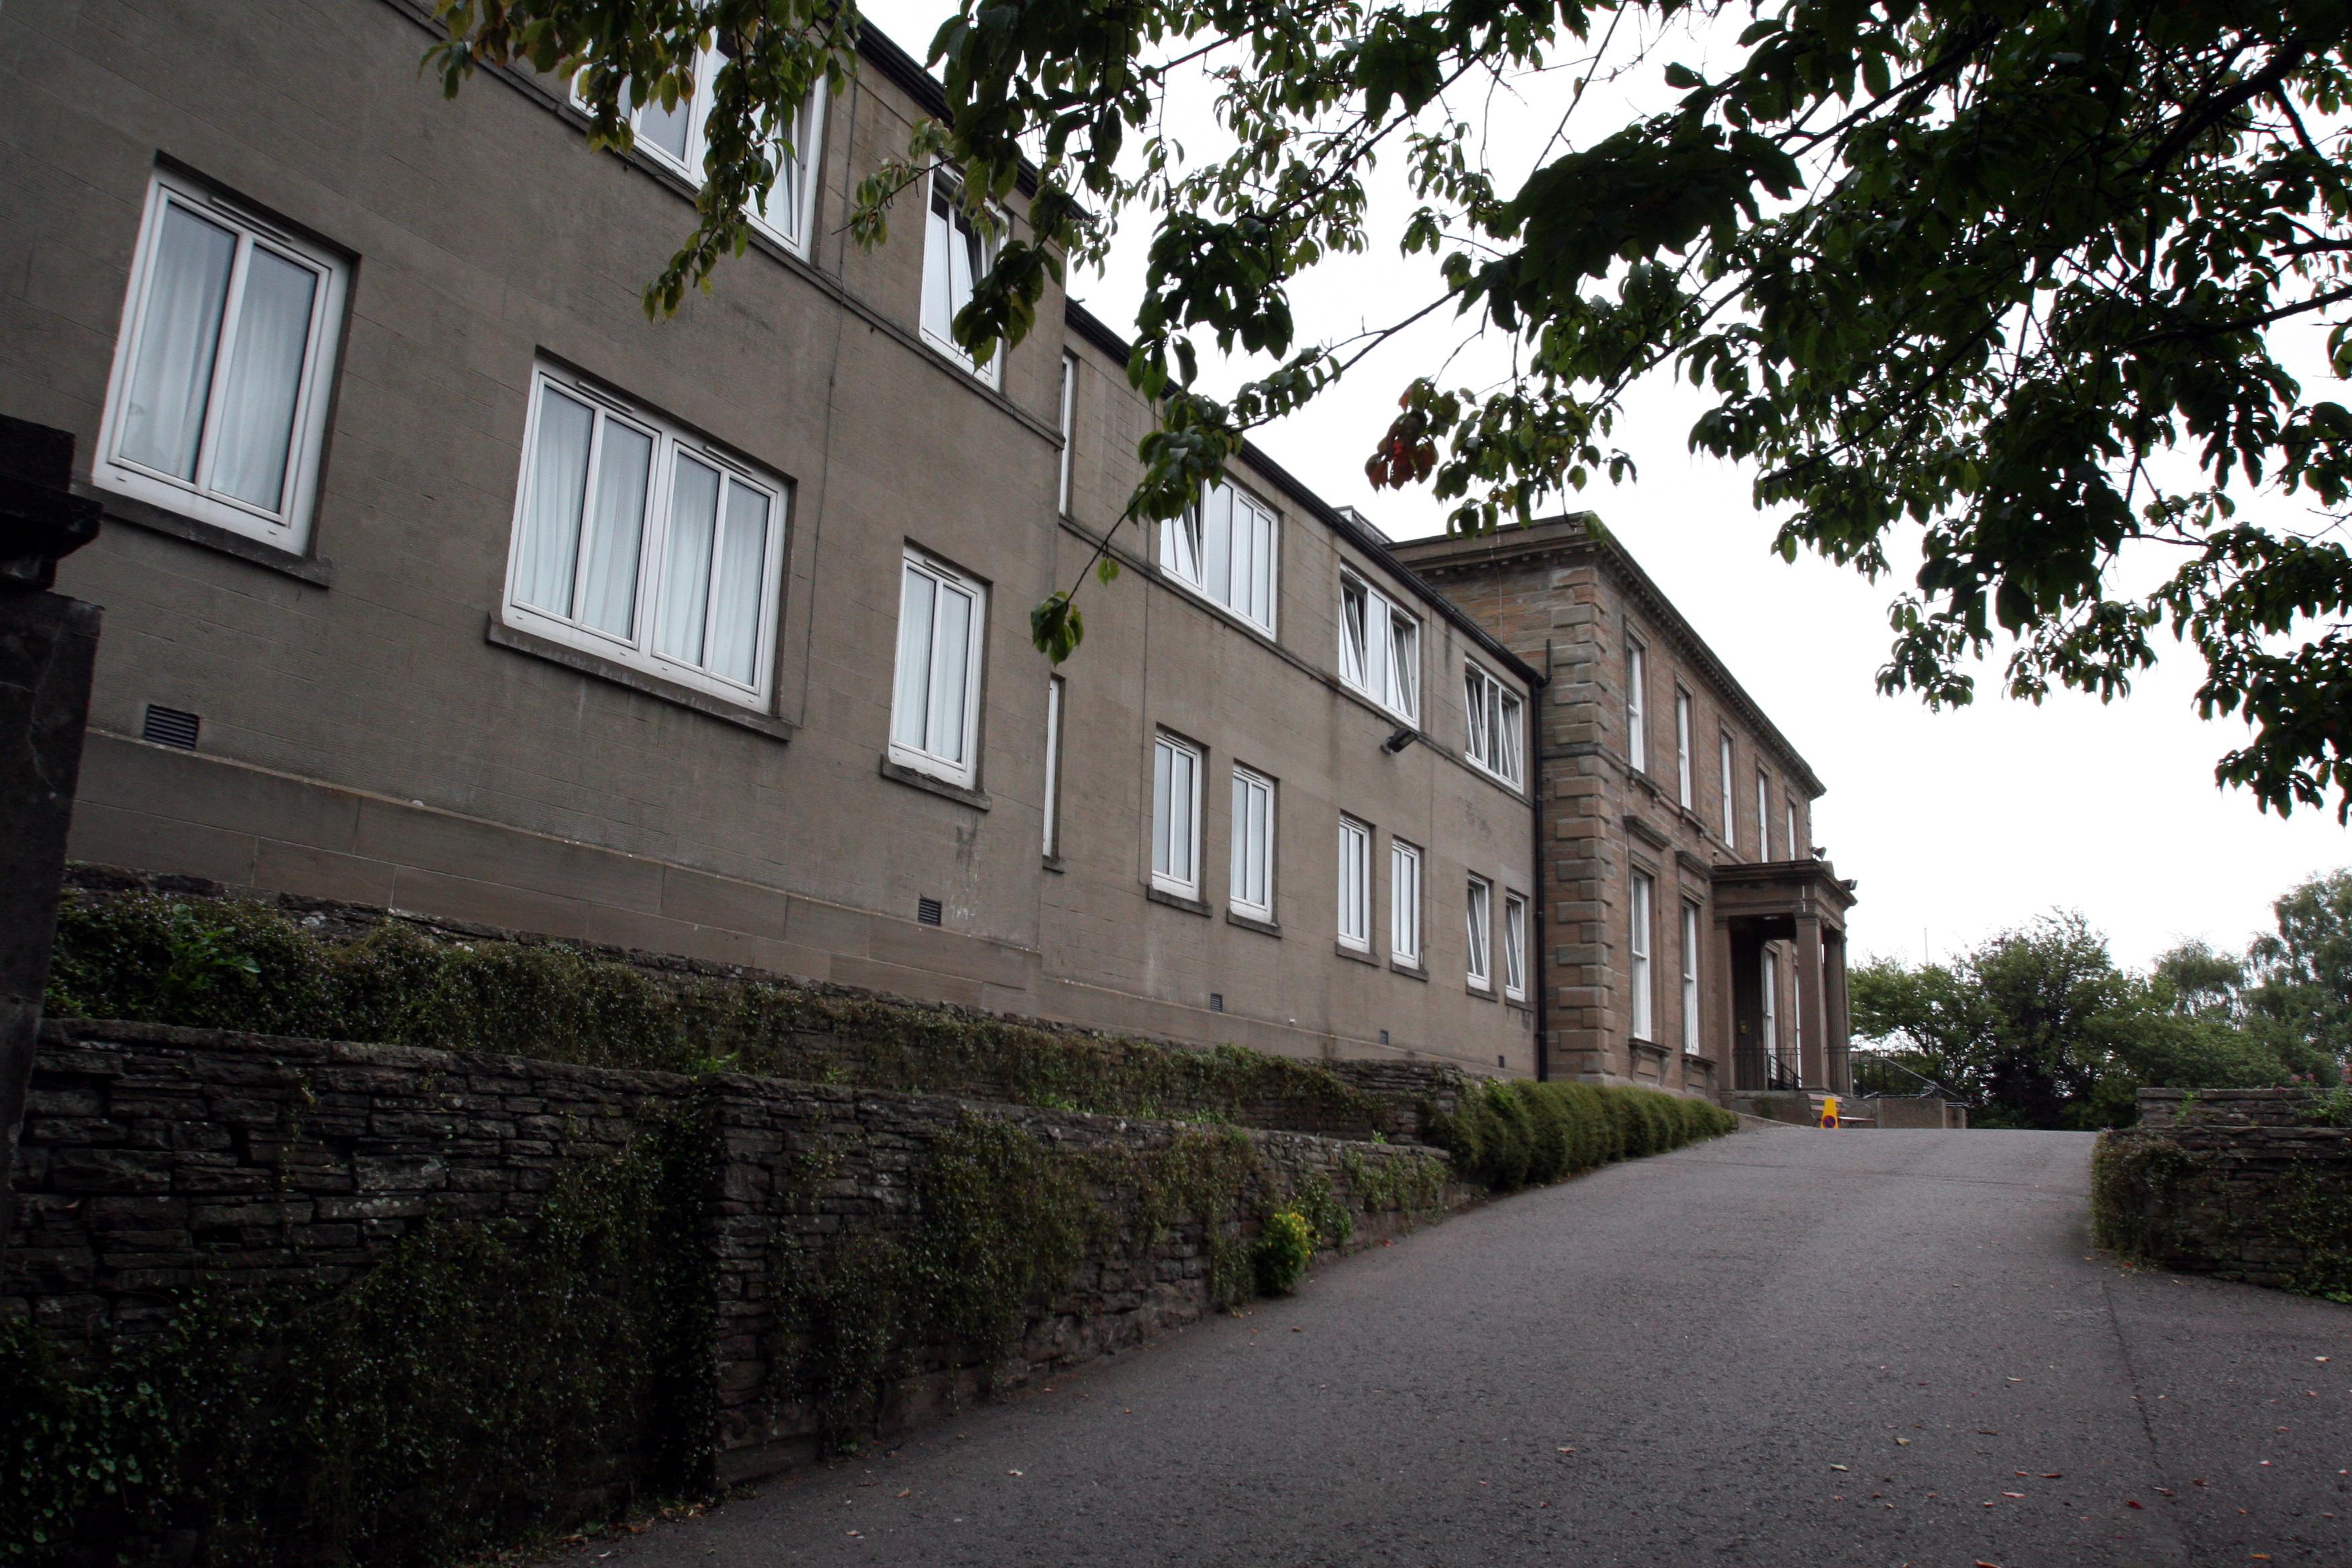 BMI Fernbrae Hospital, Perth Road, Dundee.